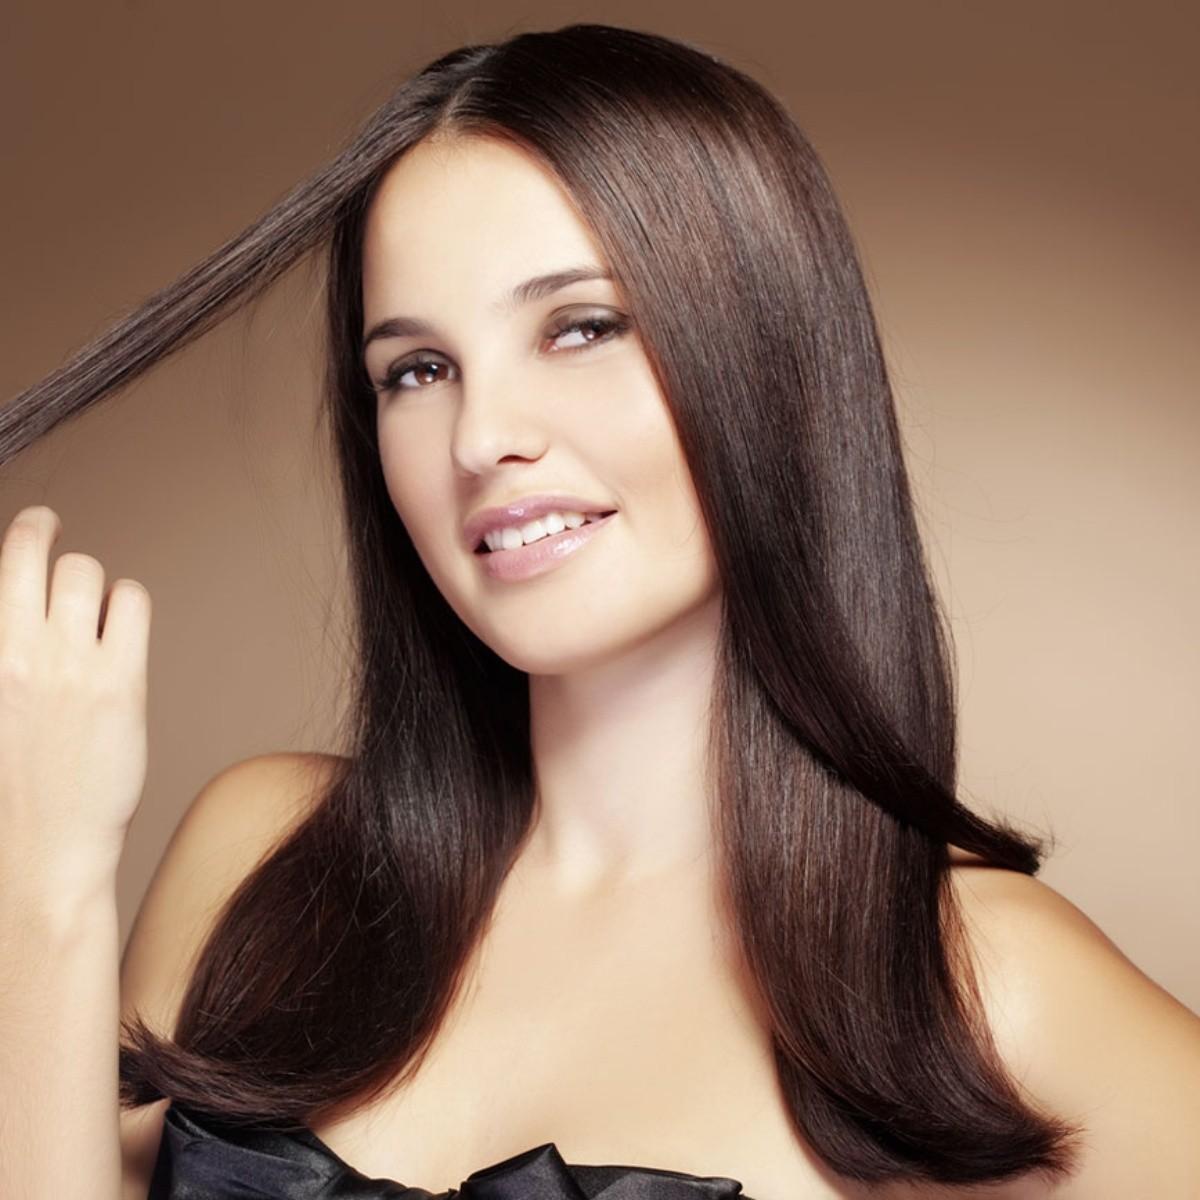 Cortes de cabello para hombres lacios rebelde